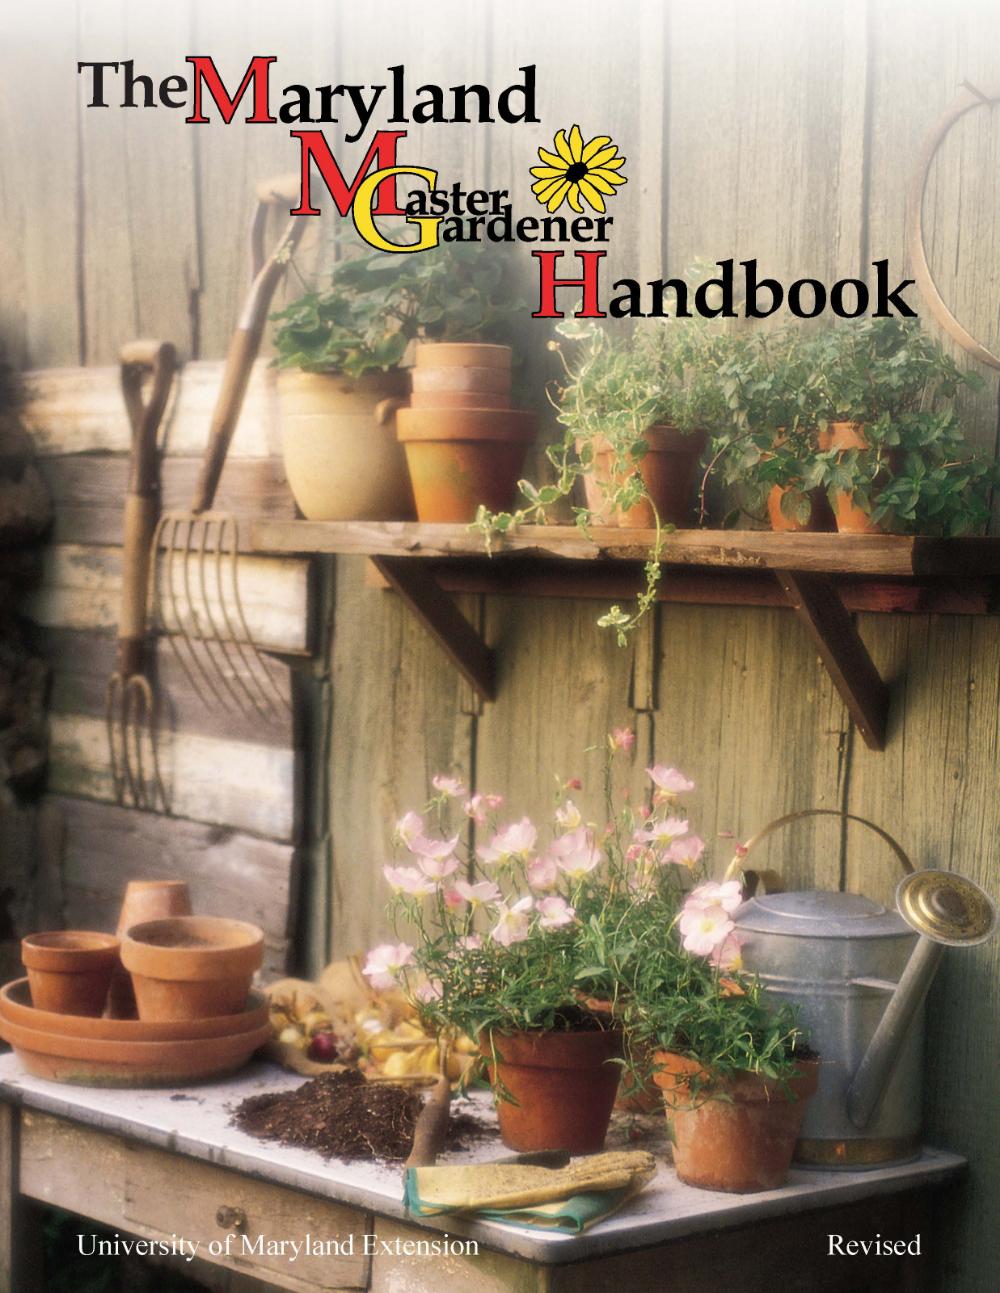 2b4b0d4171e12bbb26a39d313ee25033 - University Of Maryland Master Gardener Handbook